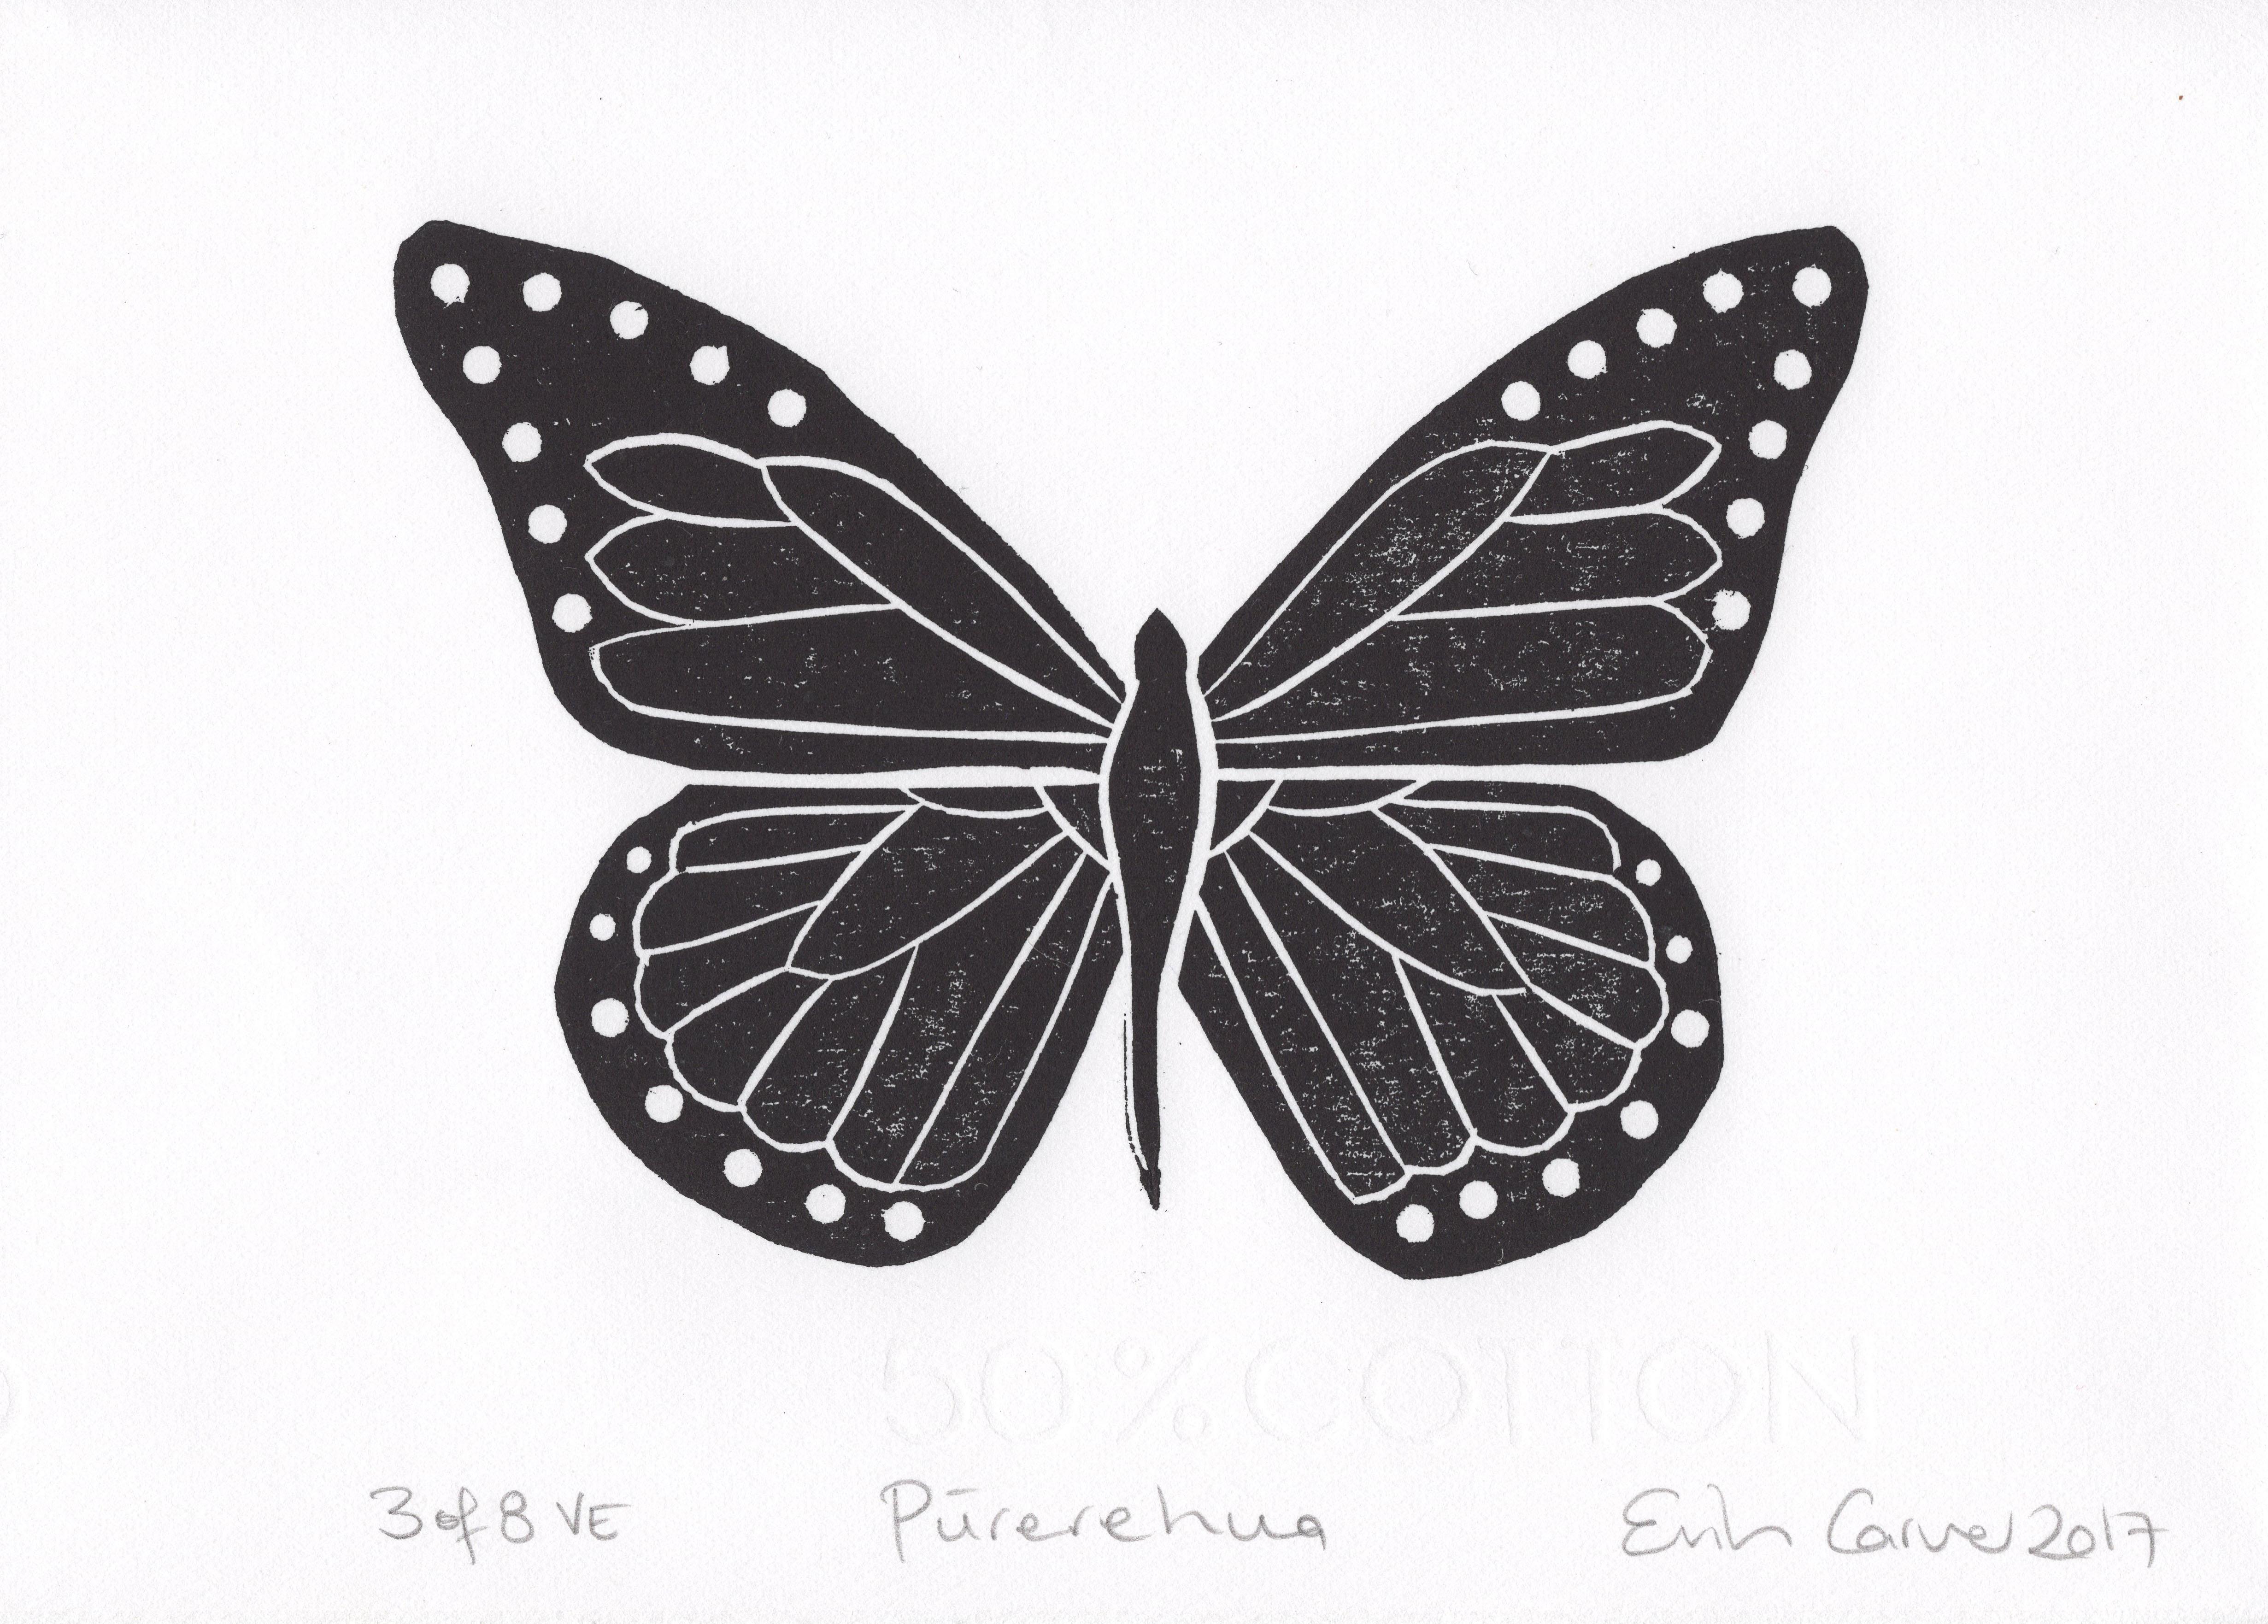 purerehua 3-8